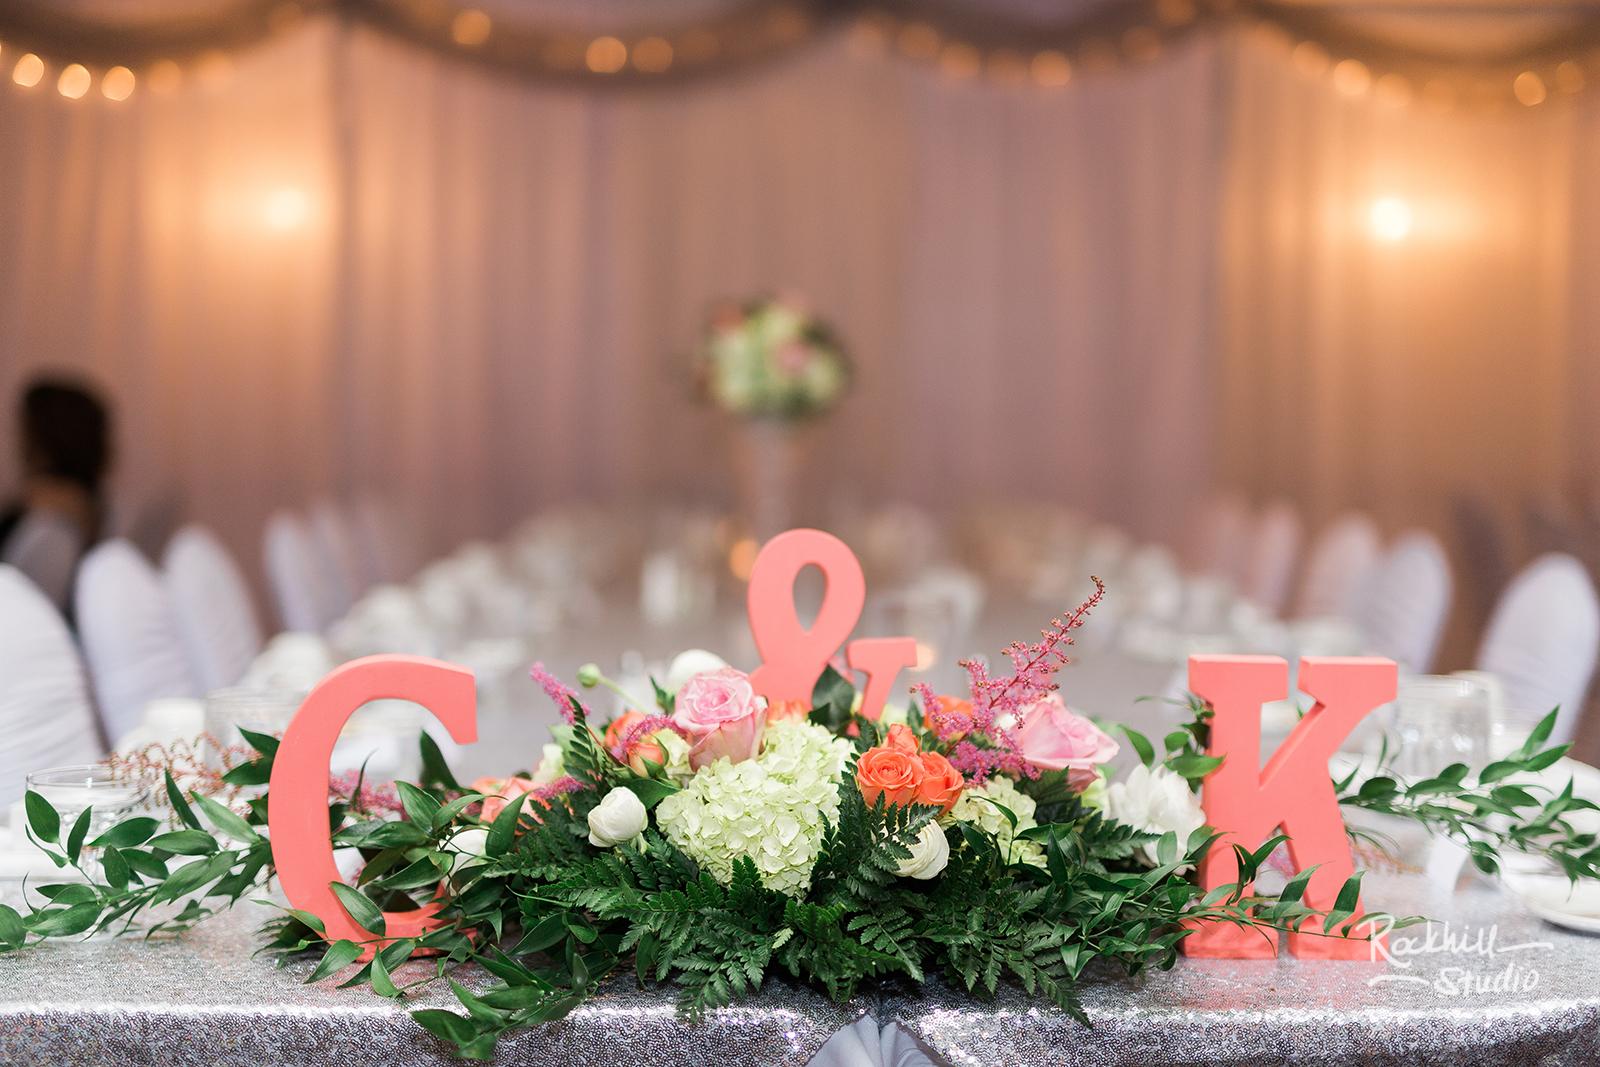 marquette-wedding-upper-peninsula-northern-michigan-wedding-ck-photography-ramada-16.jpg